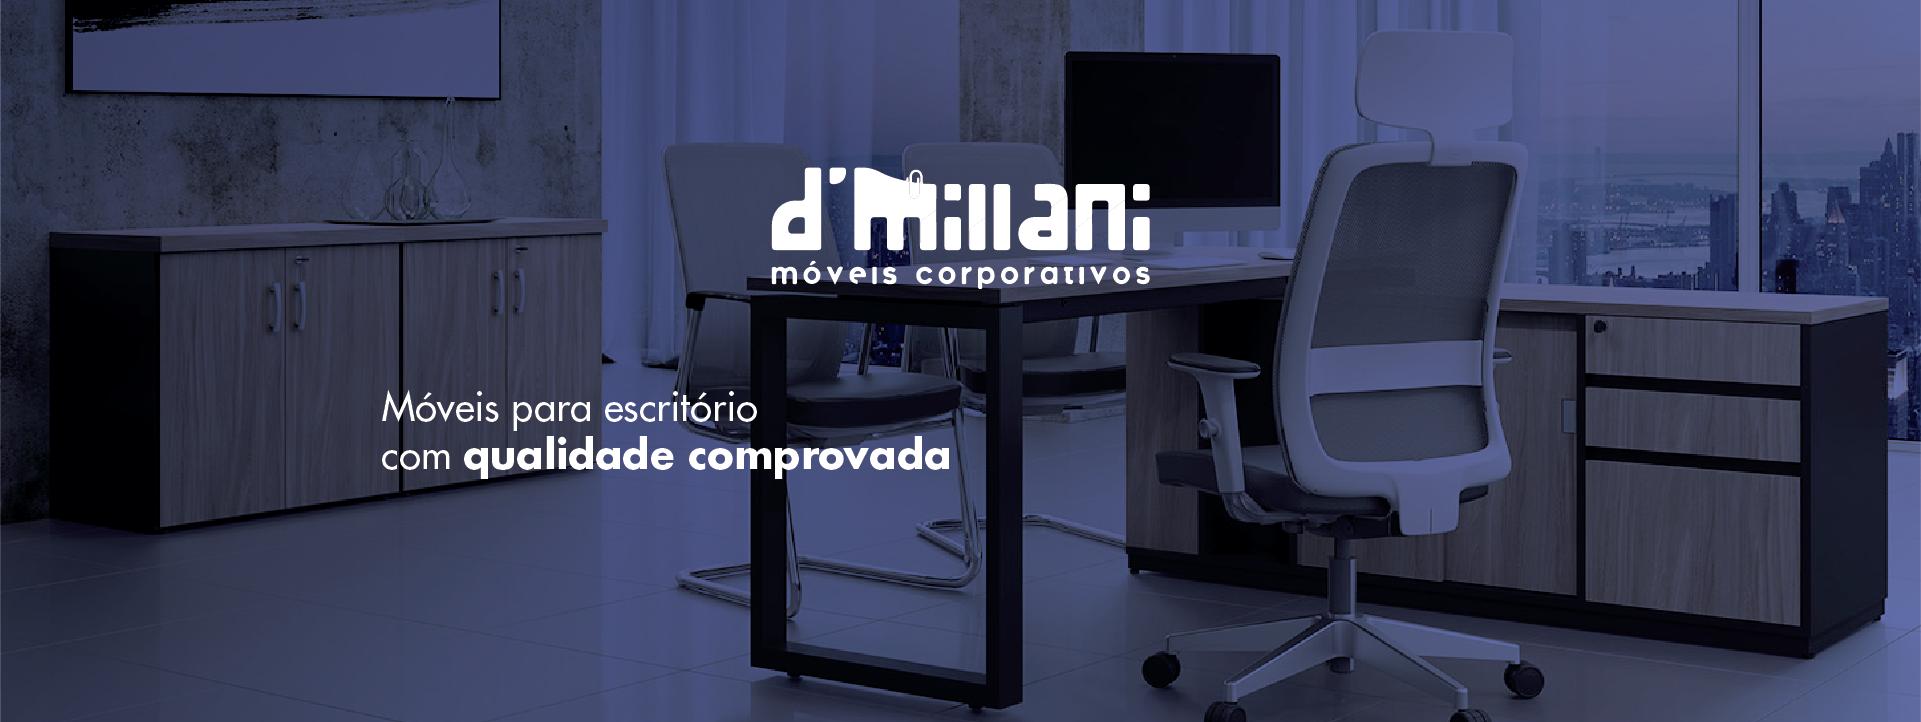 http://dmillani.com.br/